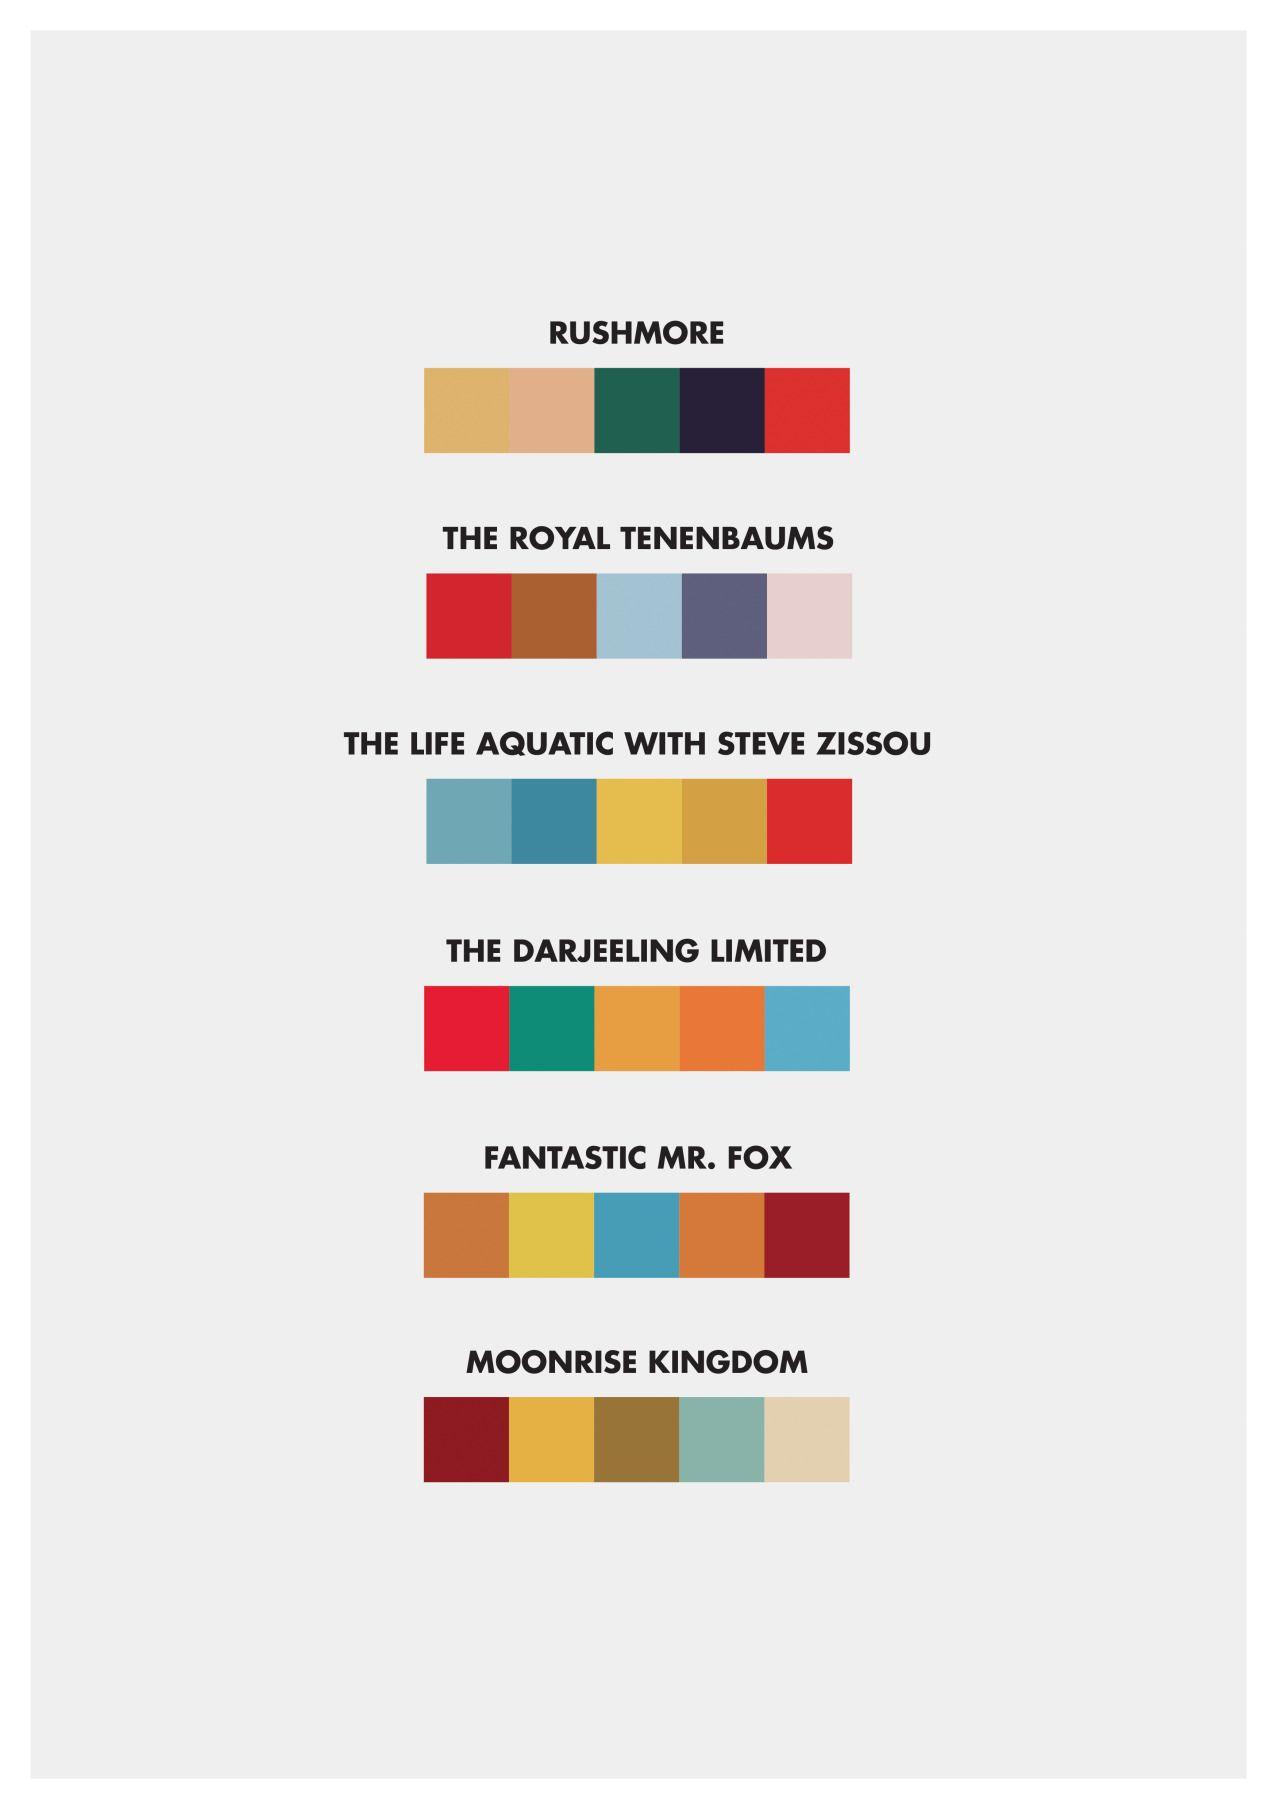 Character Design Color Palette : Wes anderson inspired color palettes character design